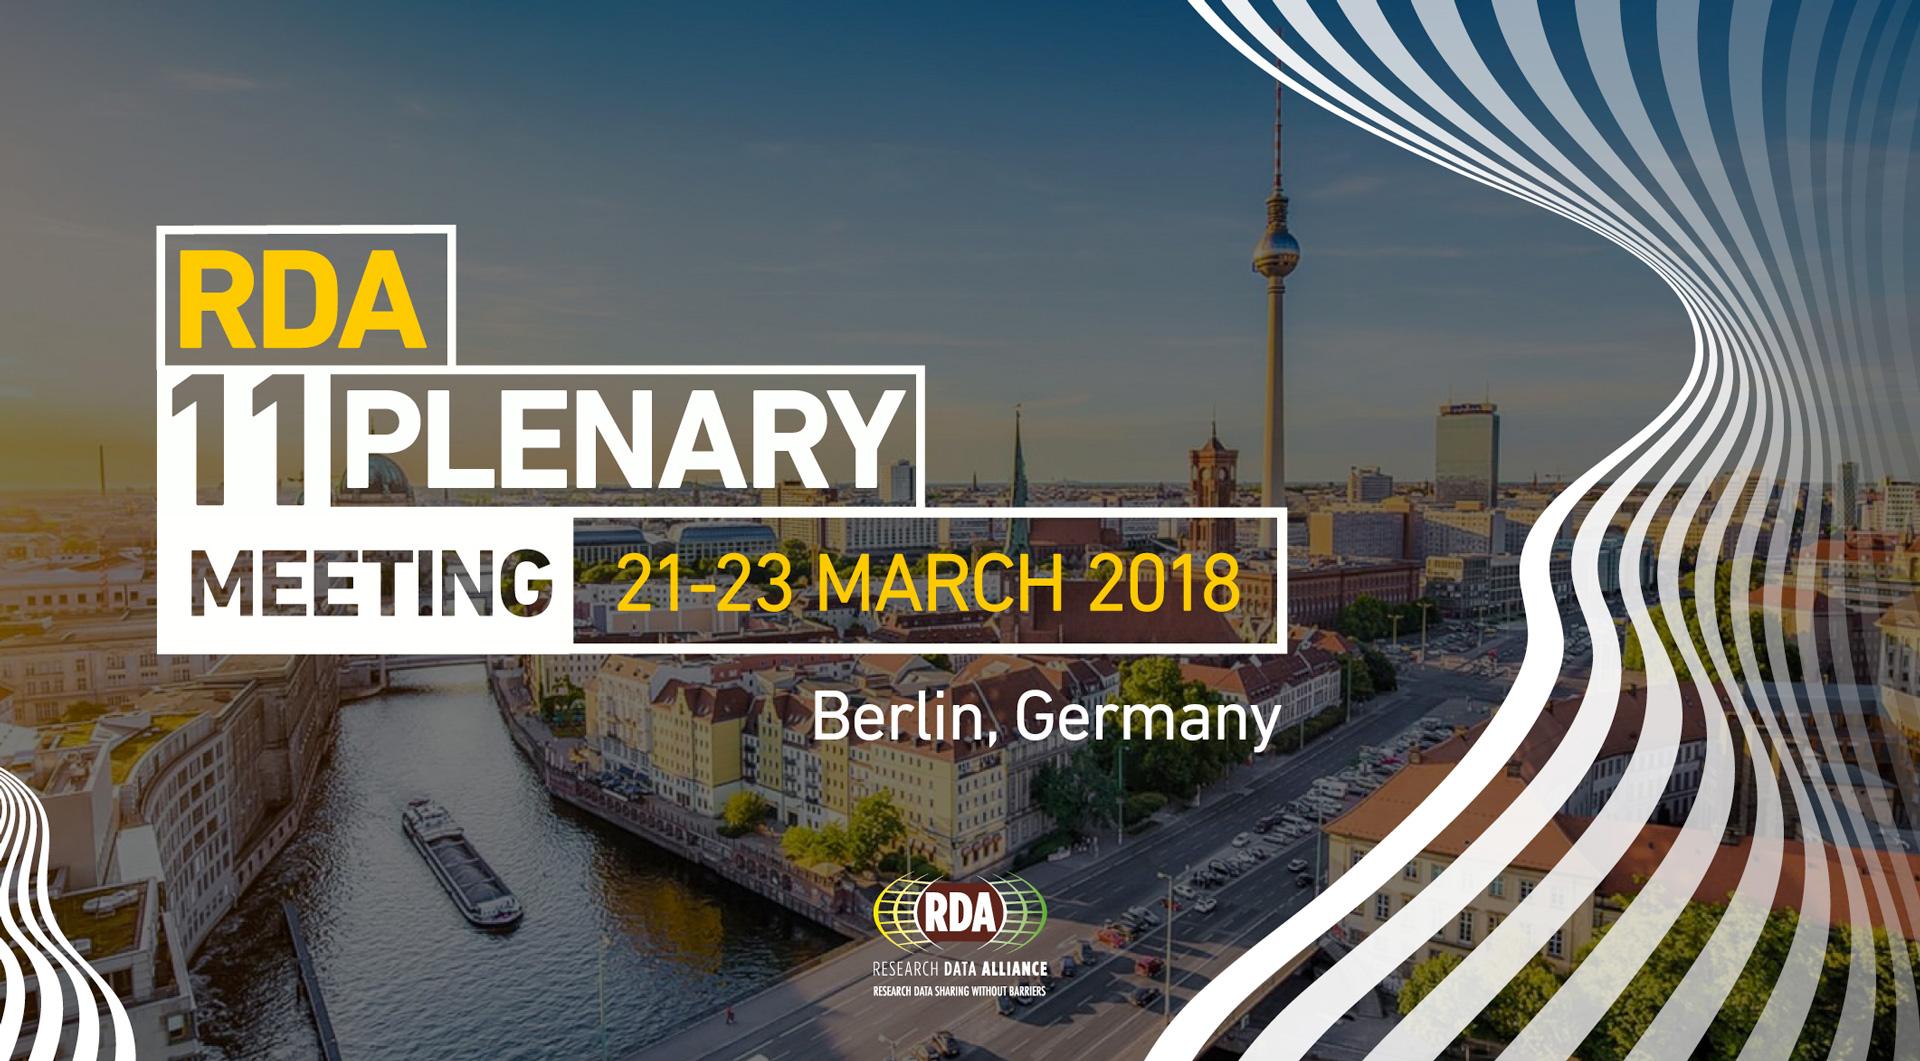 RDA Eleventh Plenary Meeting, Berlin, Germany